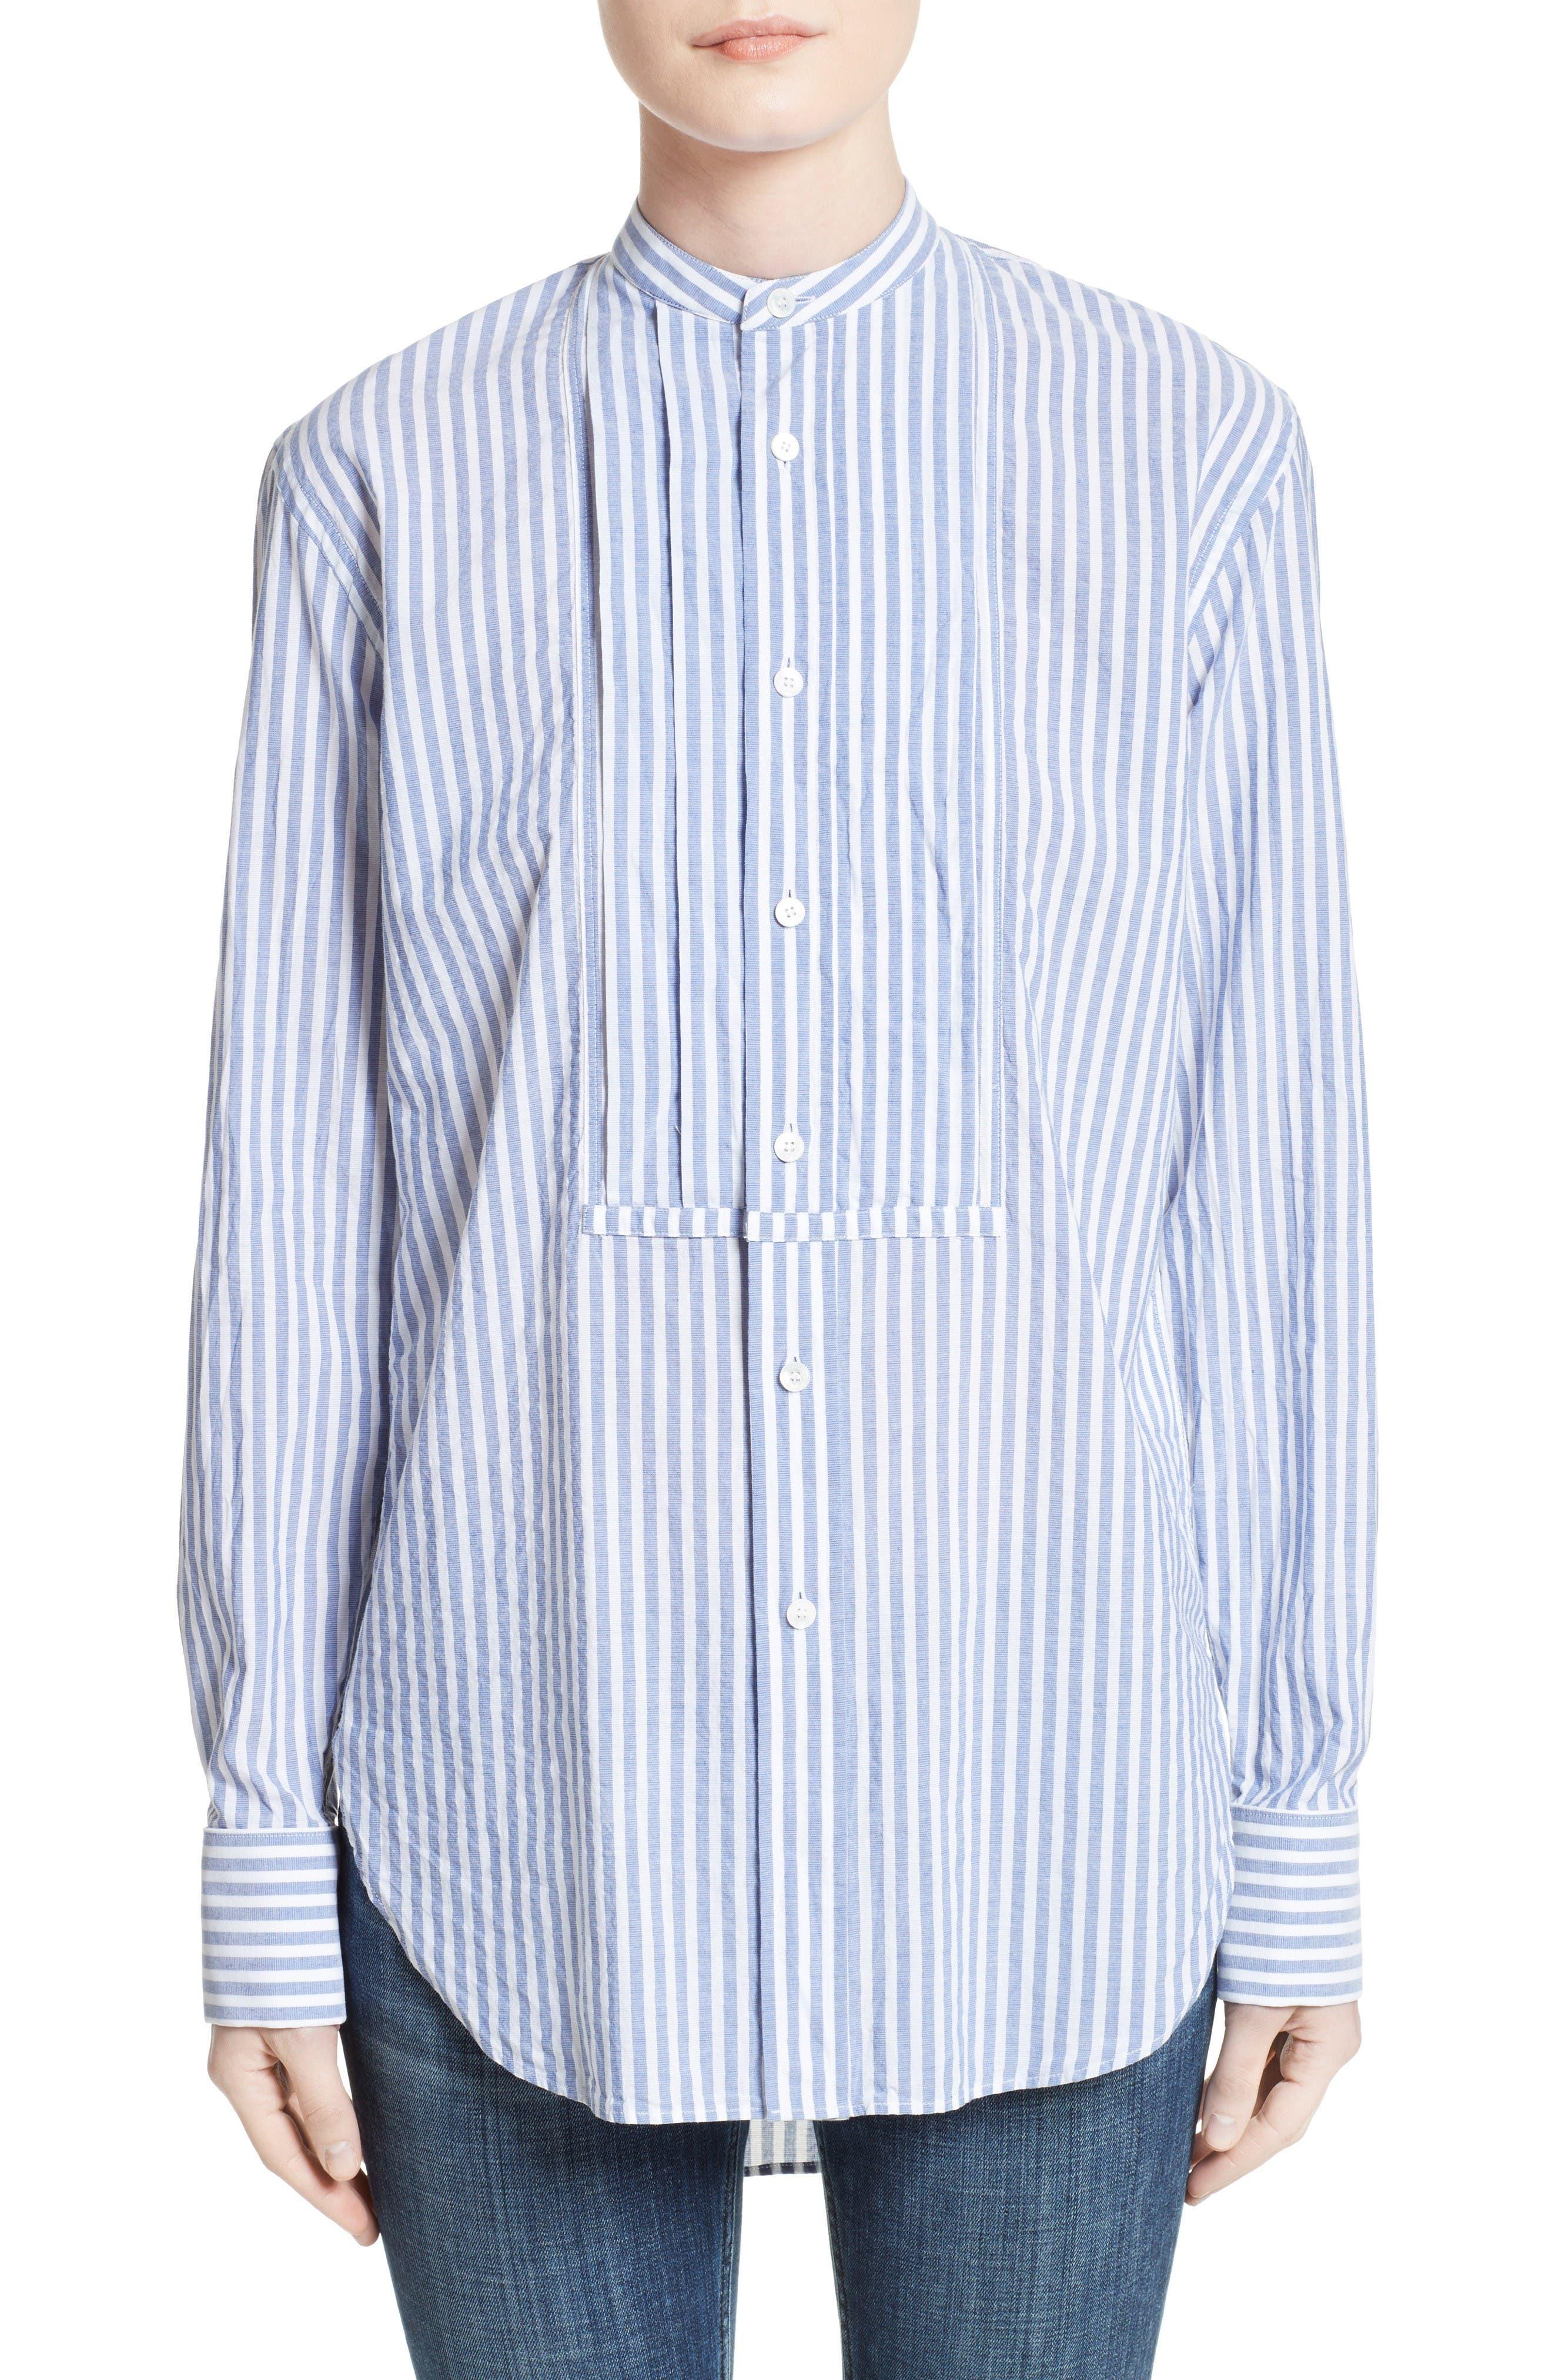 Main Image - Burberry Benfleet Stripe Cotton Top